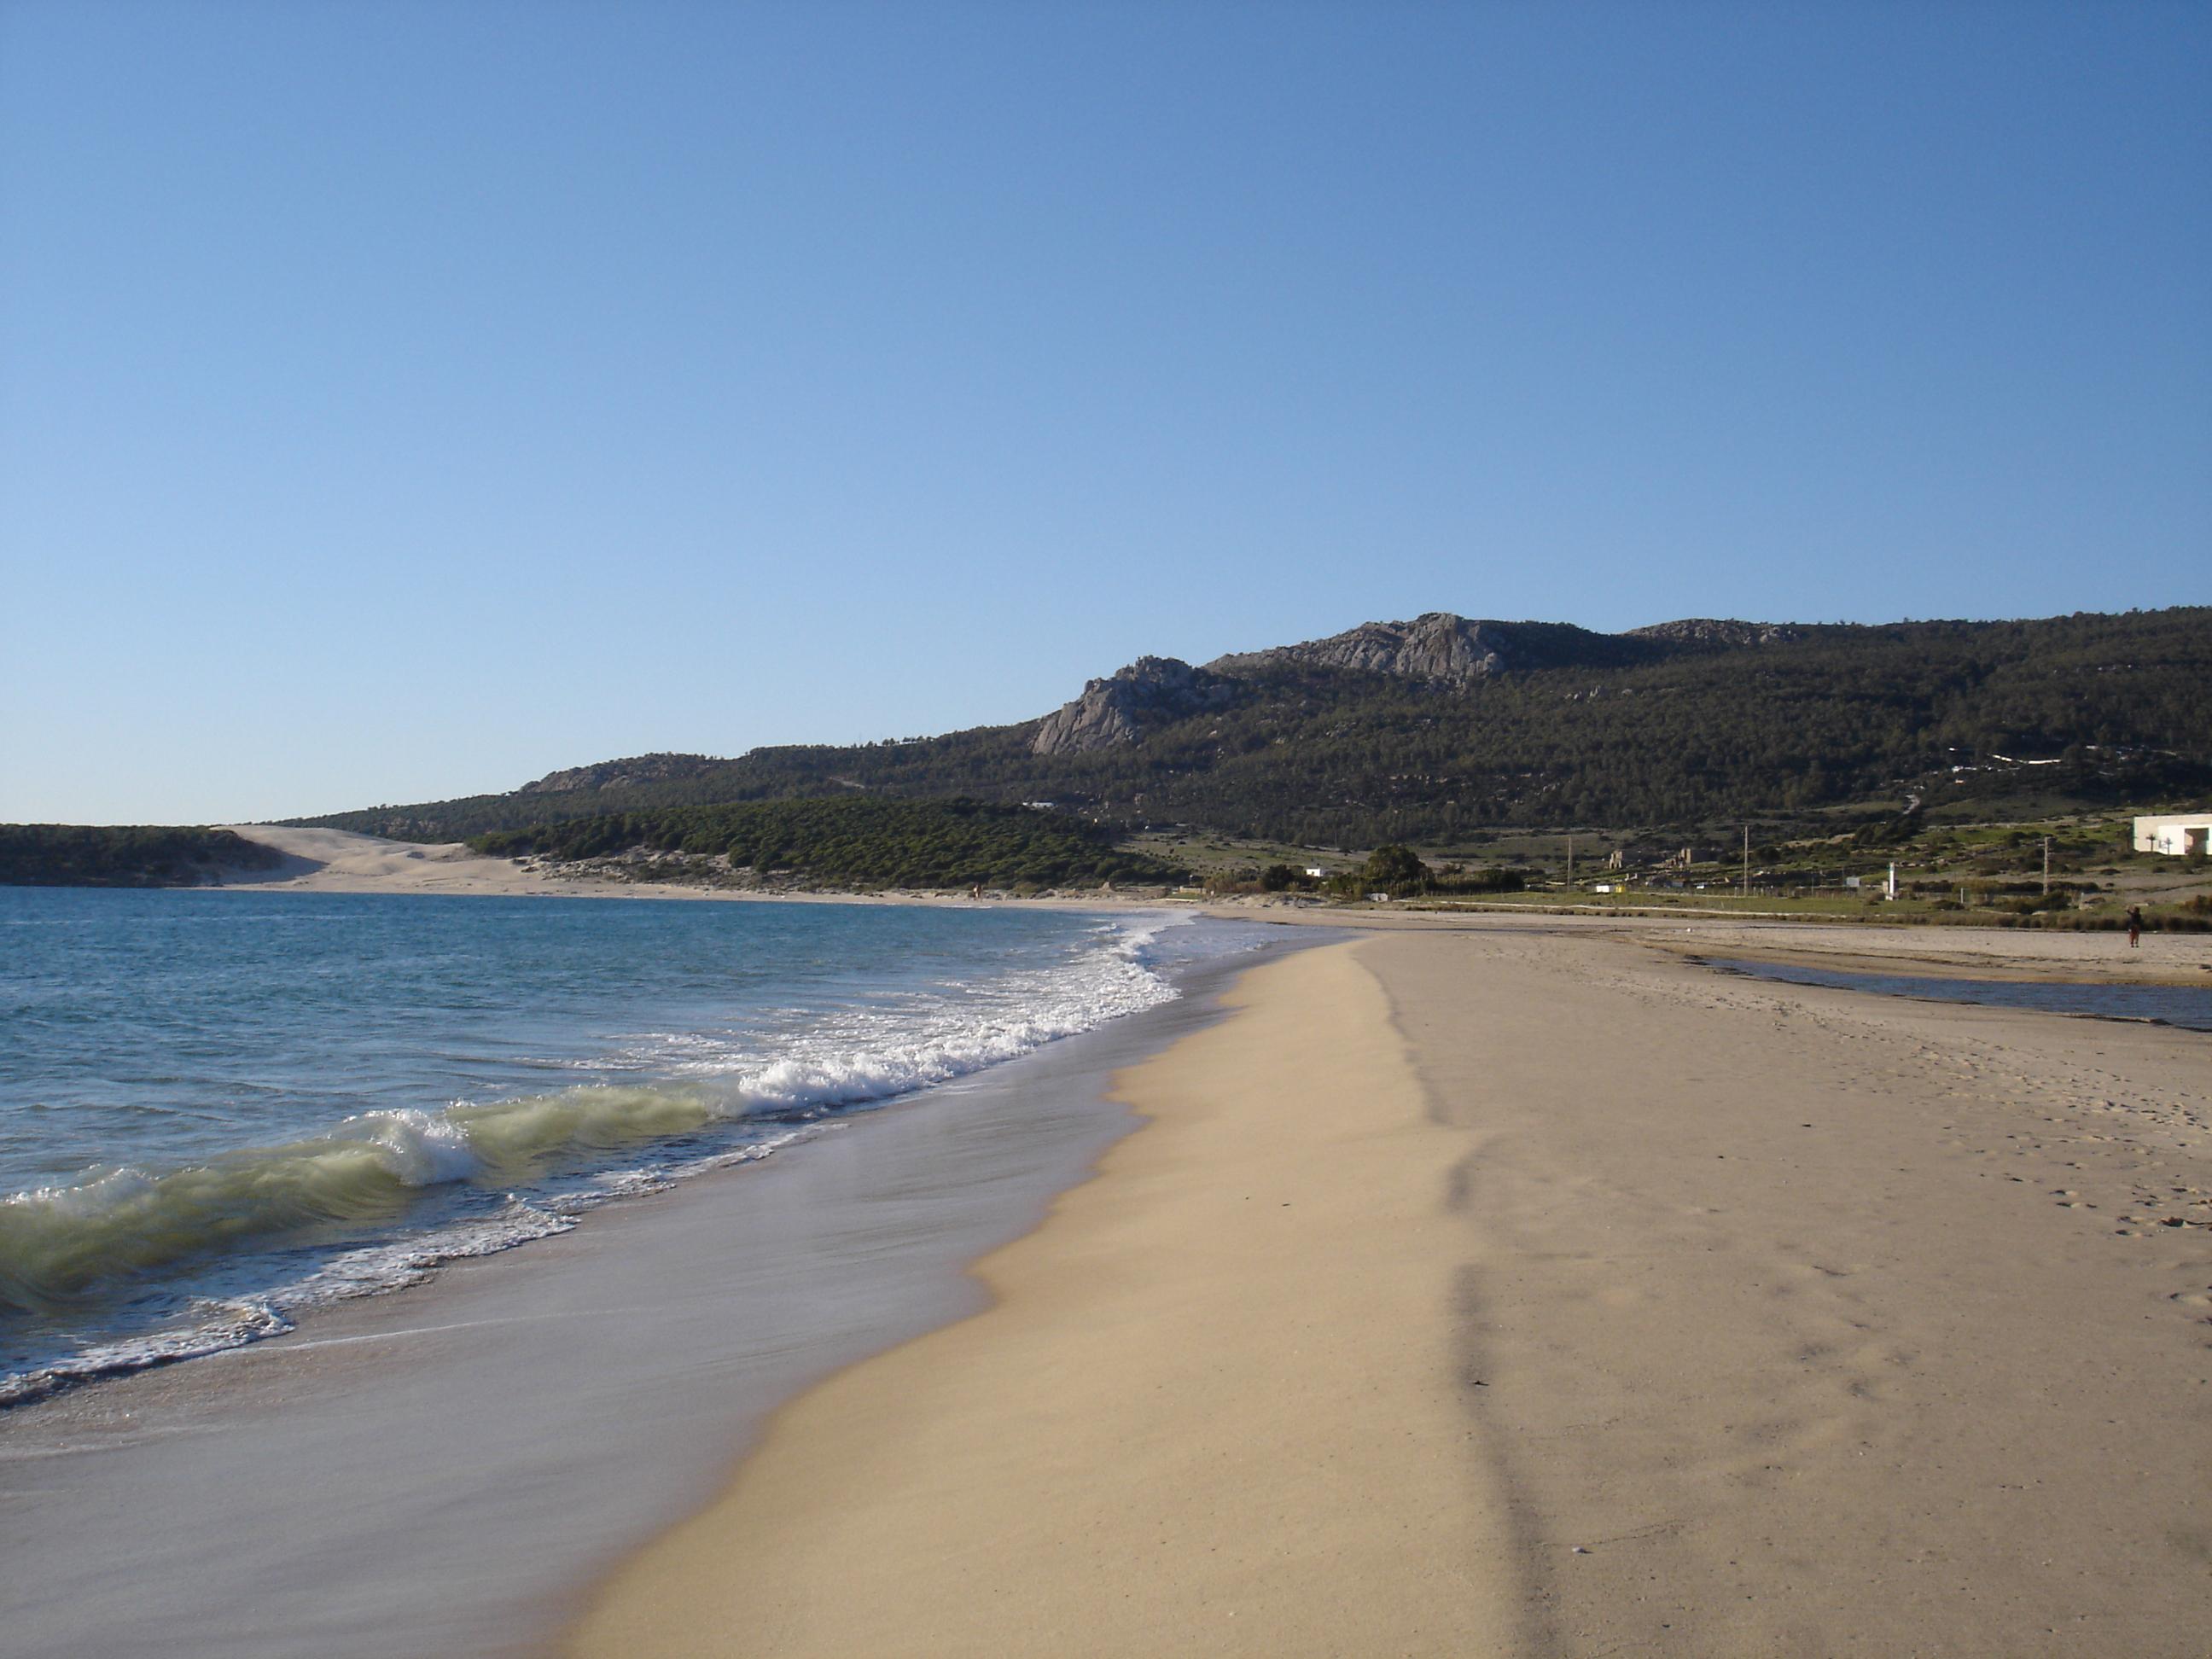 Foto playa Bolonia. La Playa de Bolonia